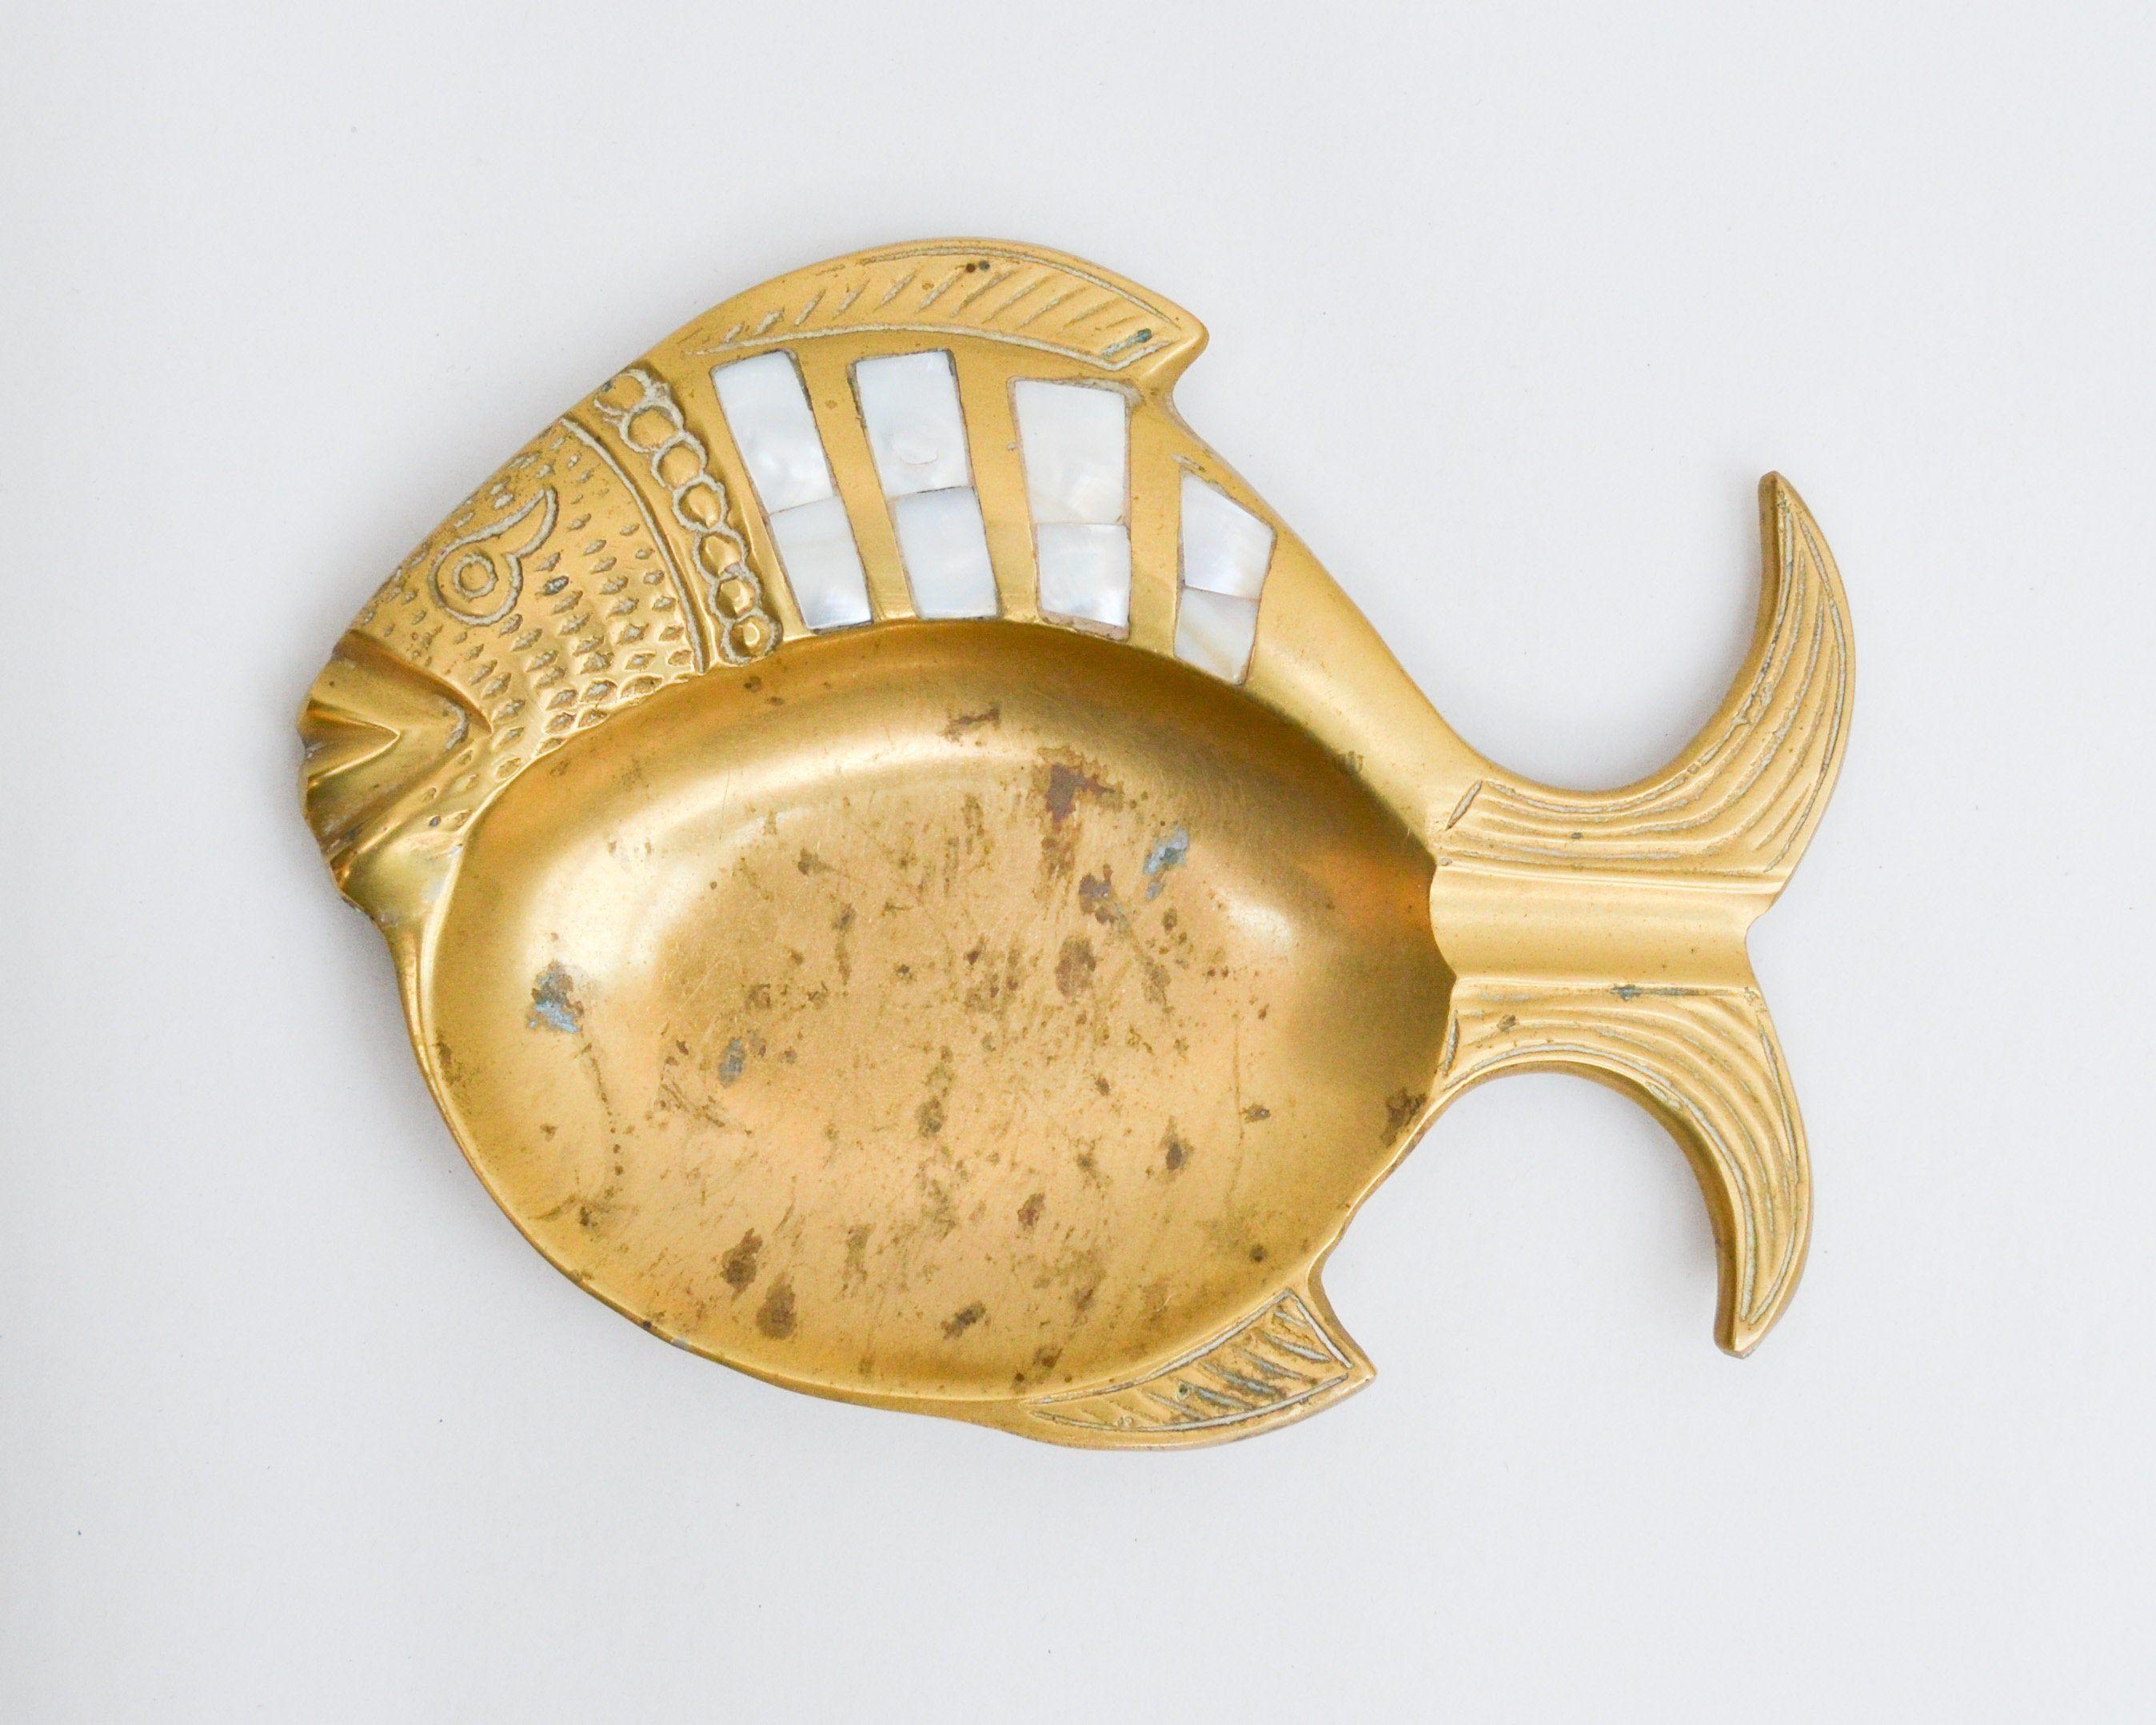 Vintage brass ring dishes catchall trinket trays trays